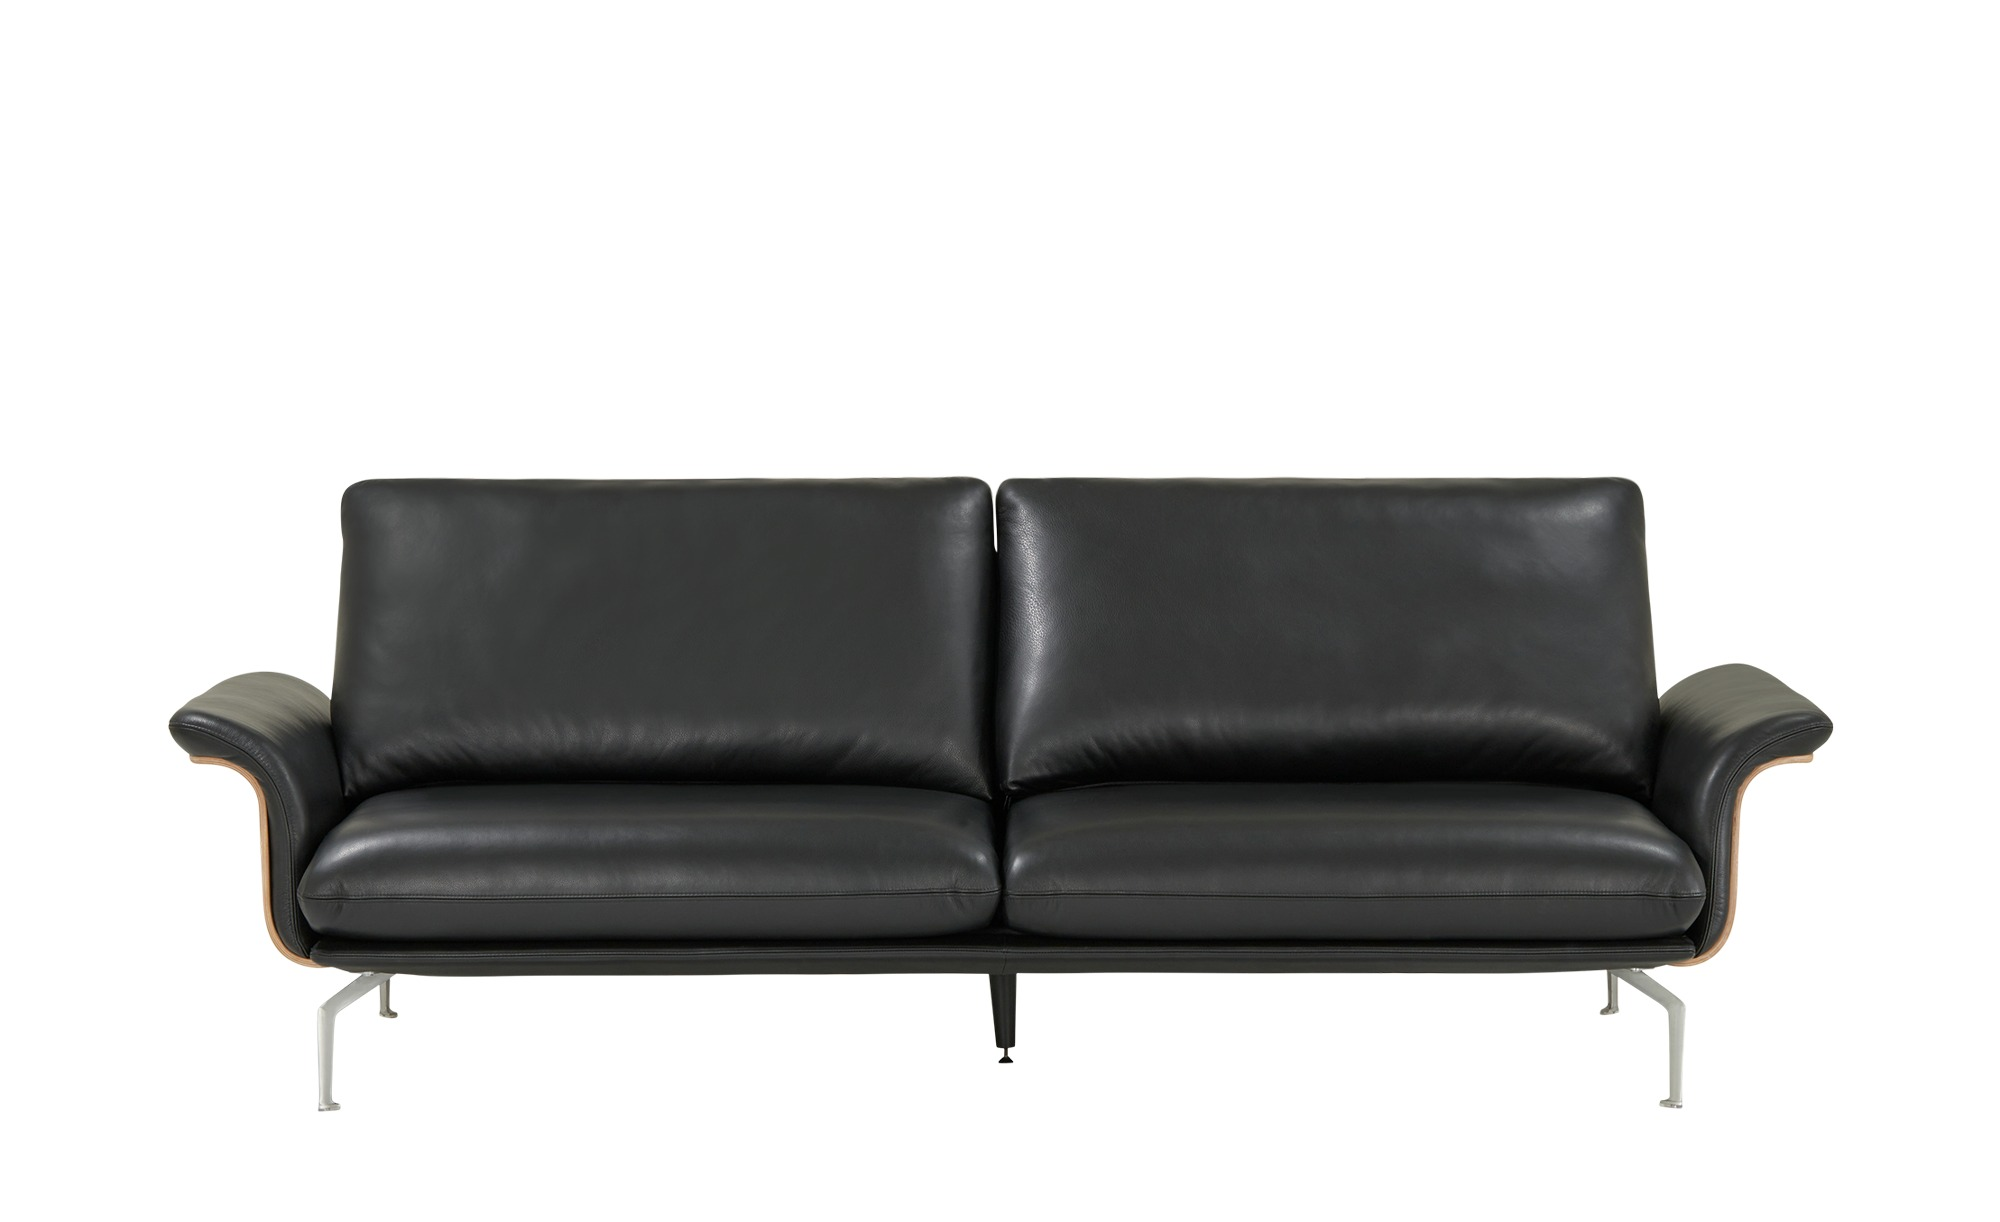 Nils Olsen Ledersofa  Alva ¦ schwarz ¦ Maße (cm): B: 244 H: 87 T: 101 Polstermöbel > Sofas > 3-Sitzer - Höffner